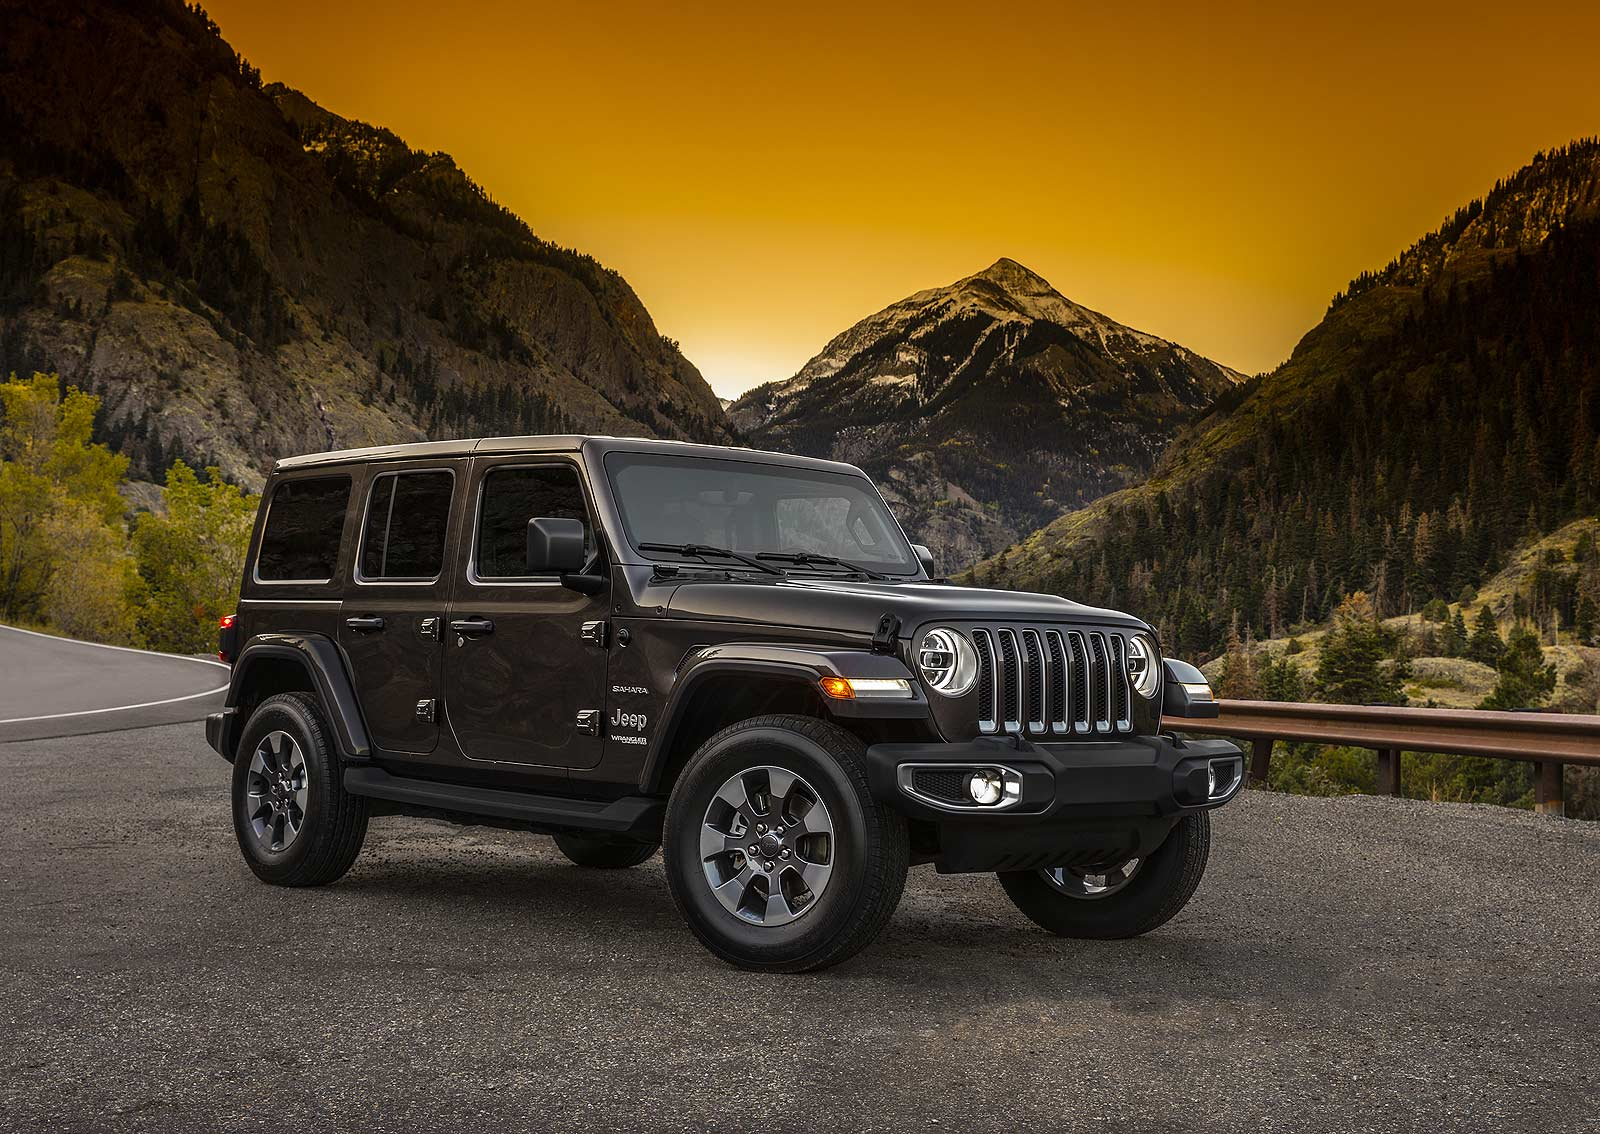 Autos que menos se devaluan Jeep Wrangler